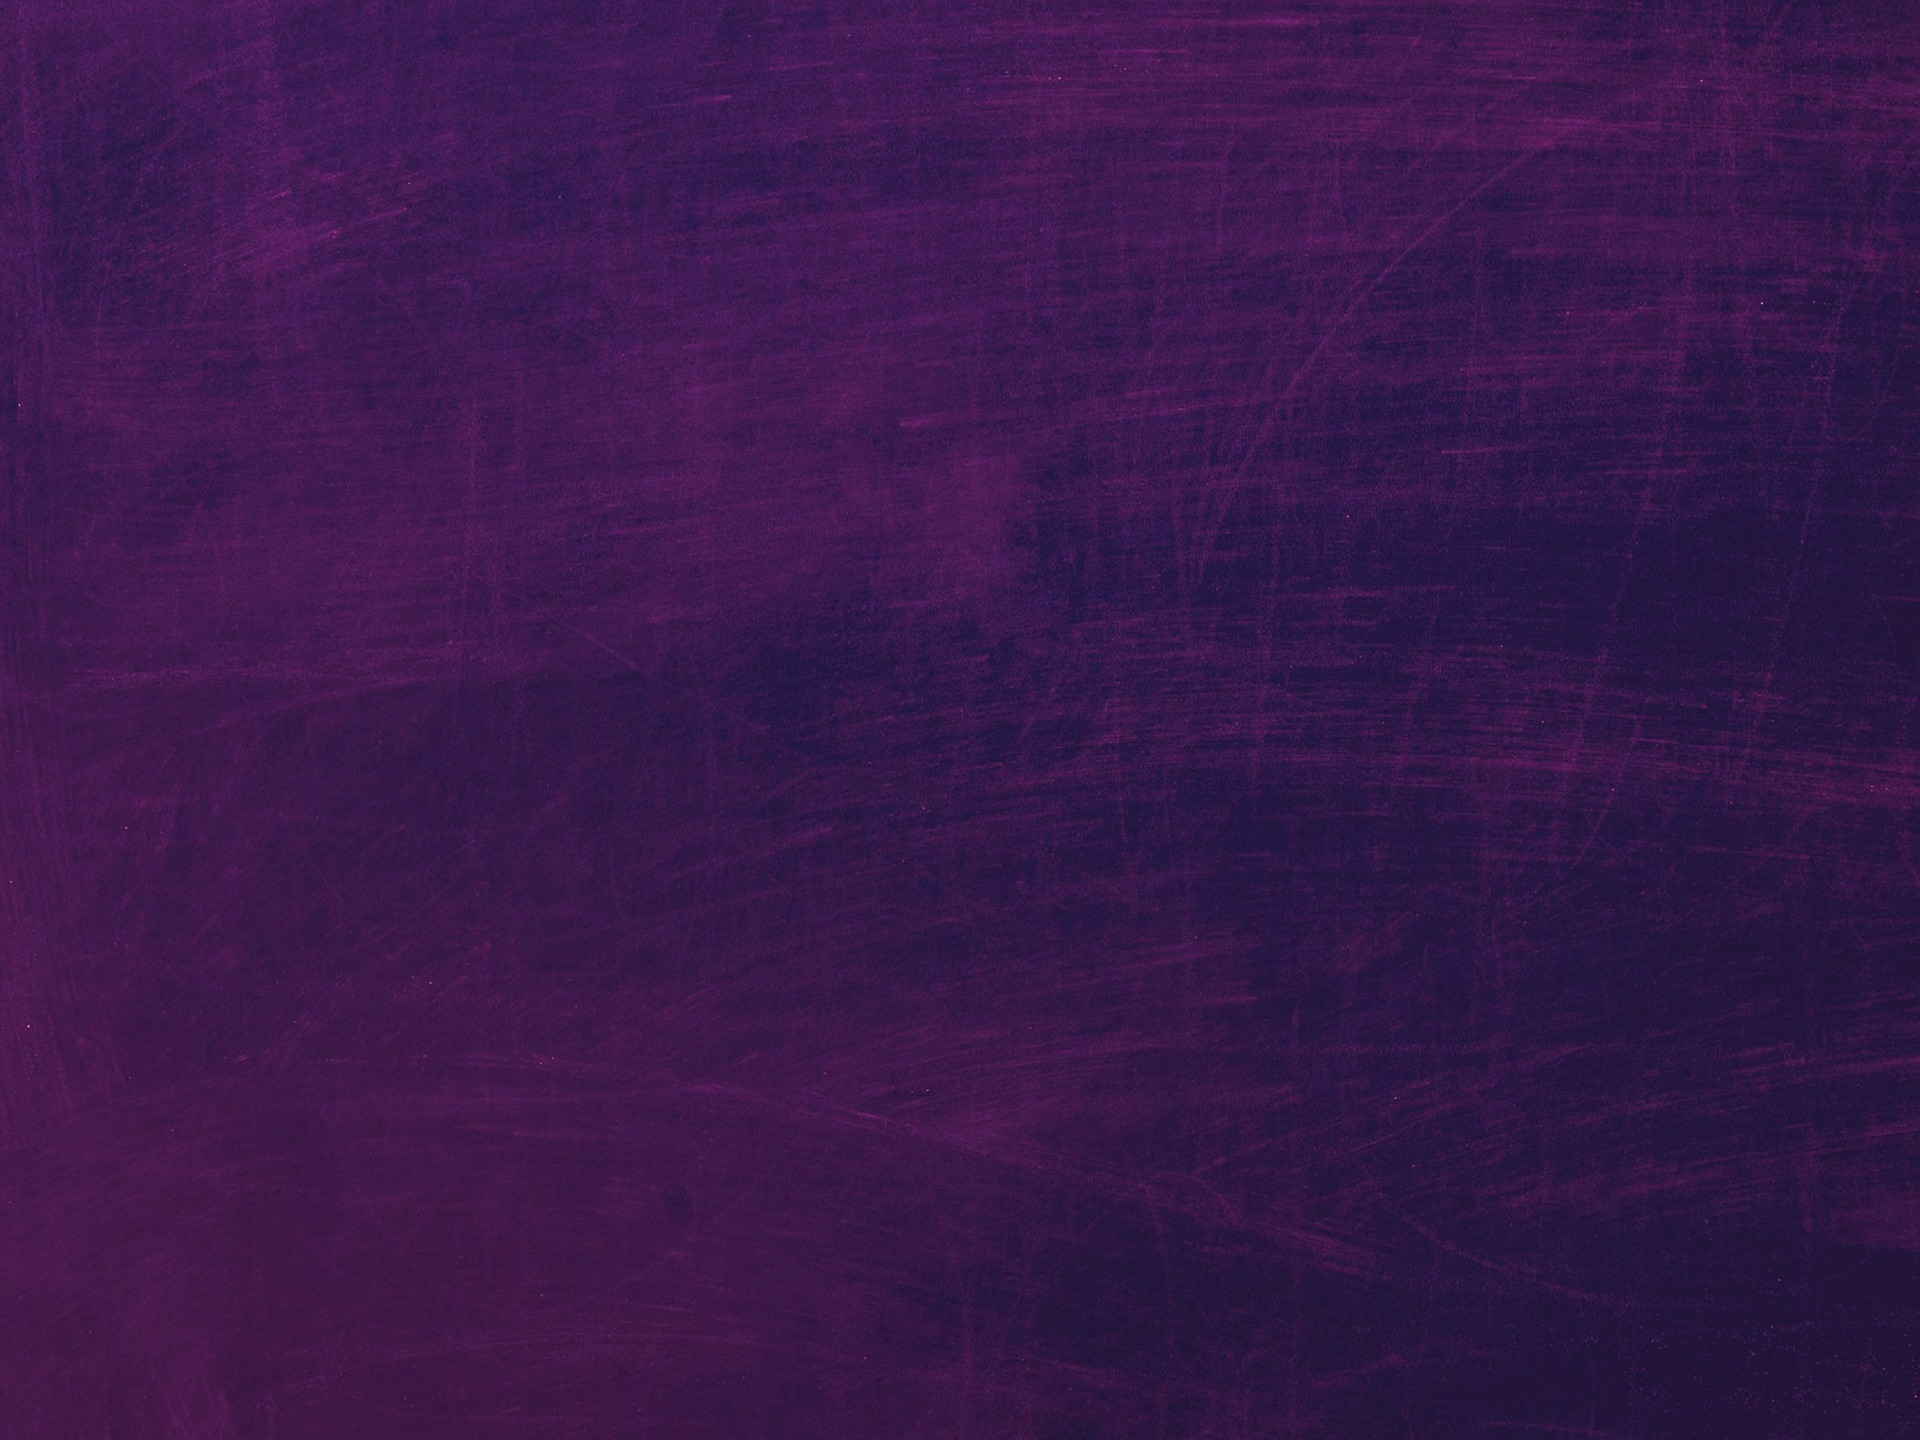 purple-465931_1920